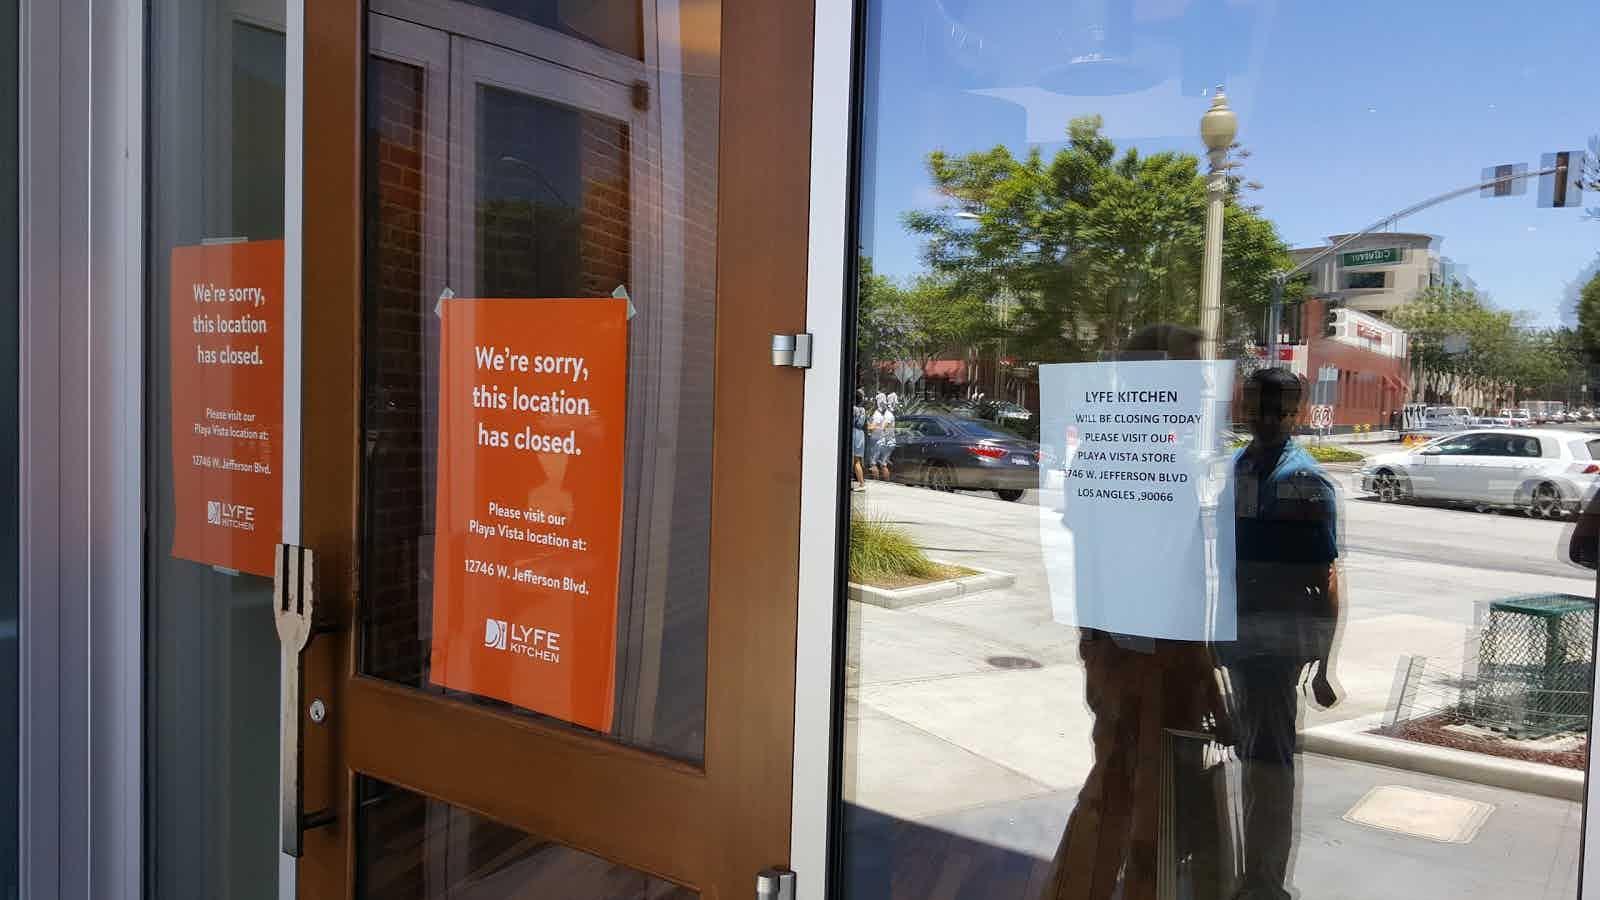 LYFE Kitchen - Culver City | Restaurant Review - Zagat